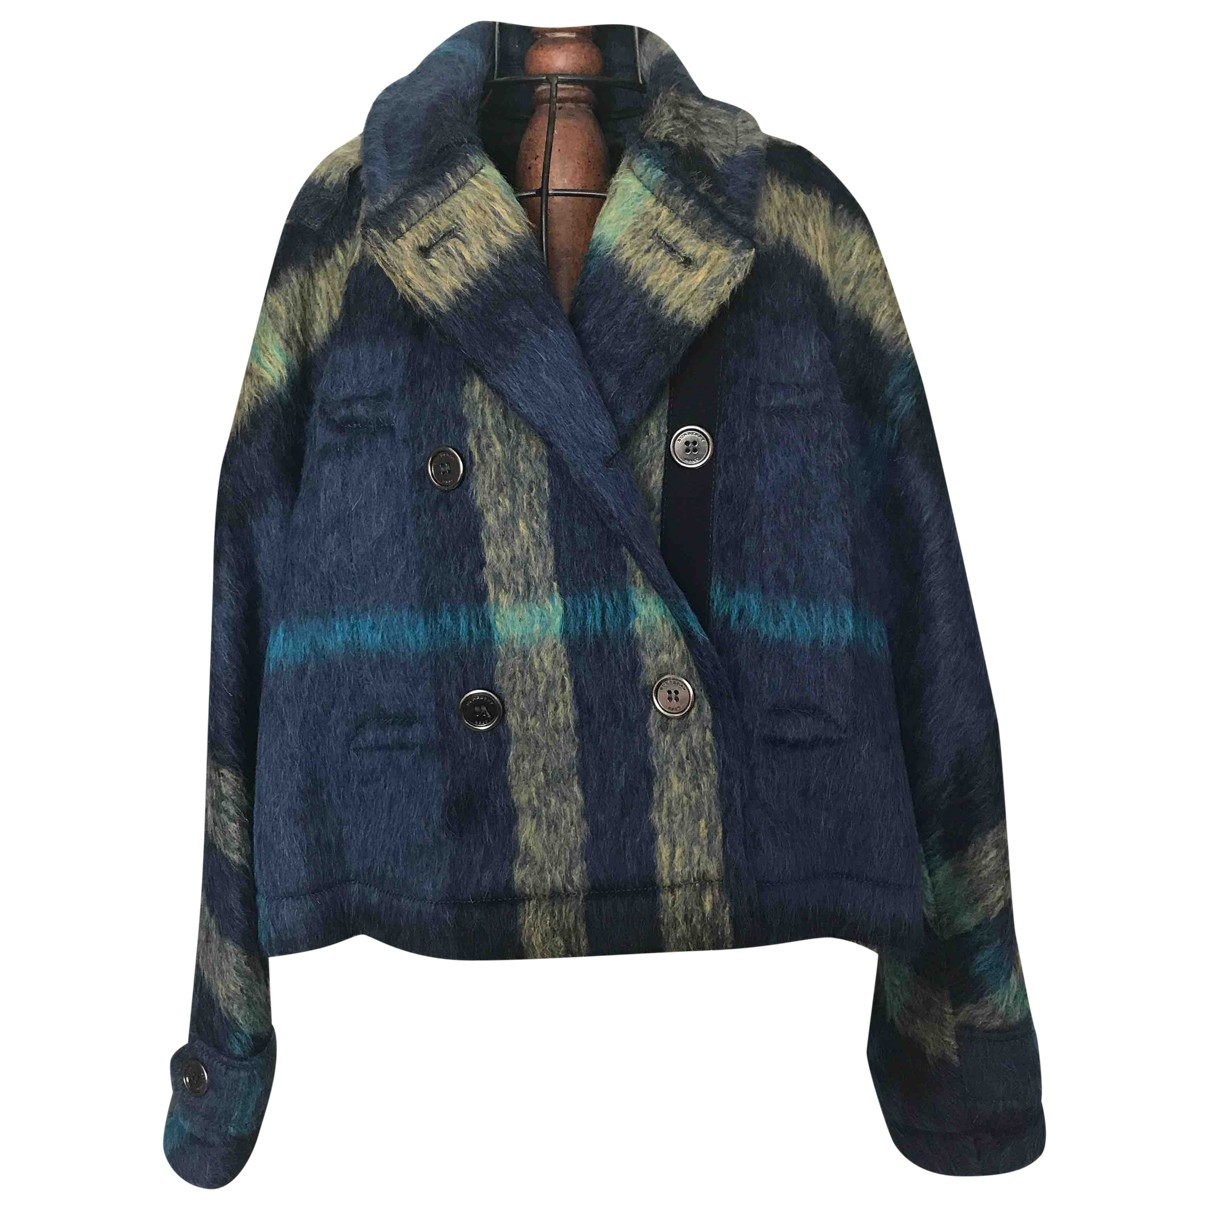 Burberry \N Jacke in  Blau Wolle